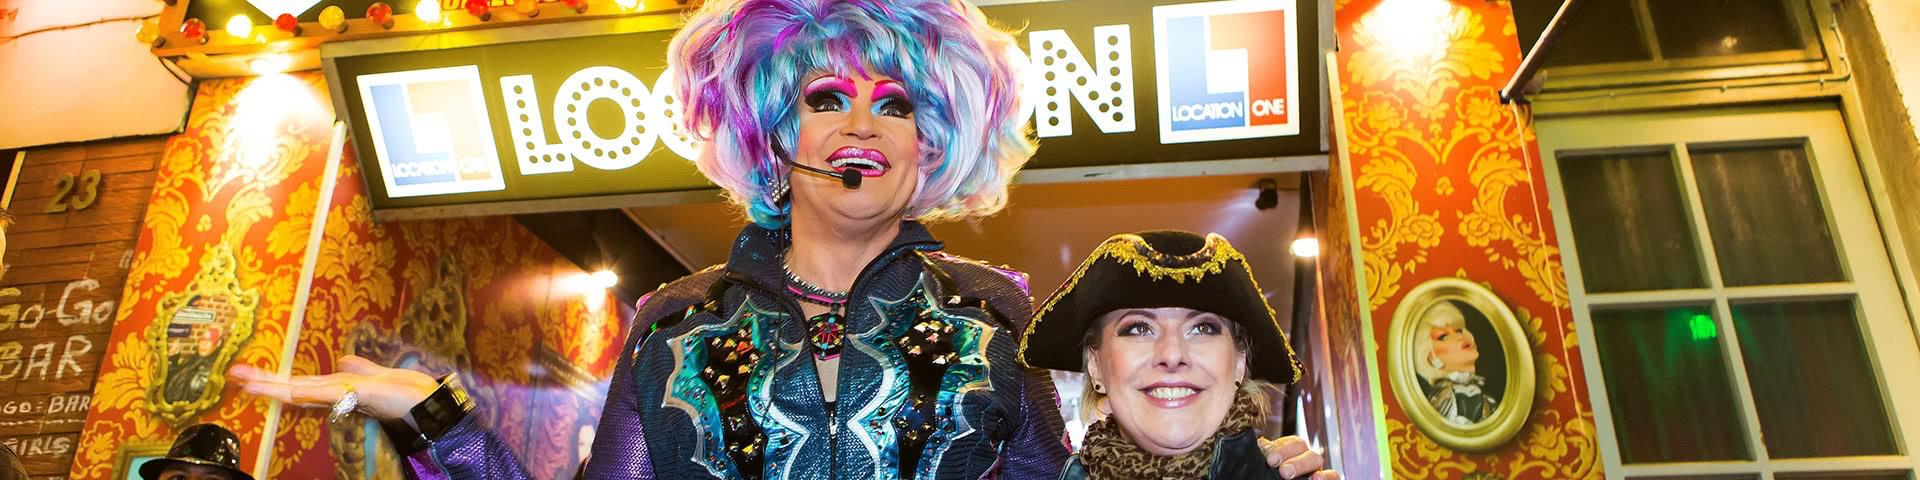 Olivia Jones vor ihrem Lokal auf dem Hamburger Kiez